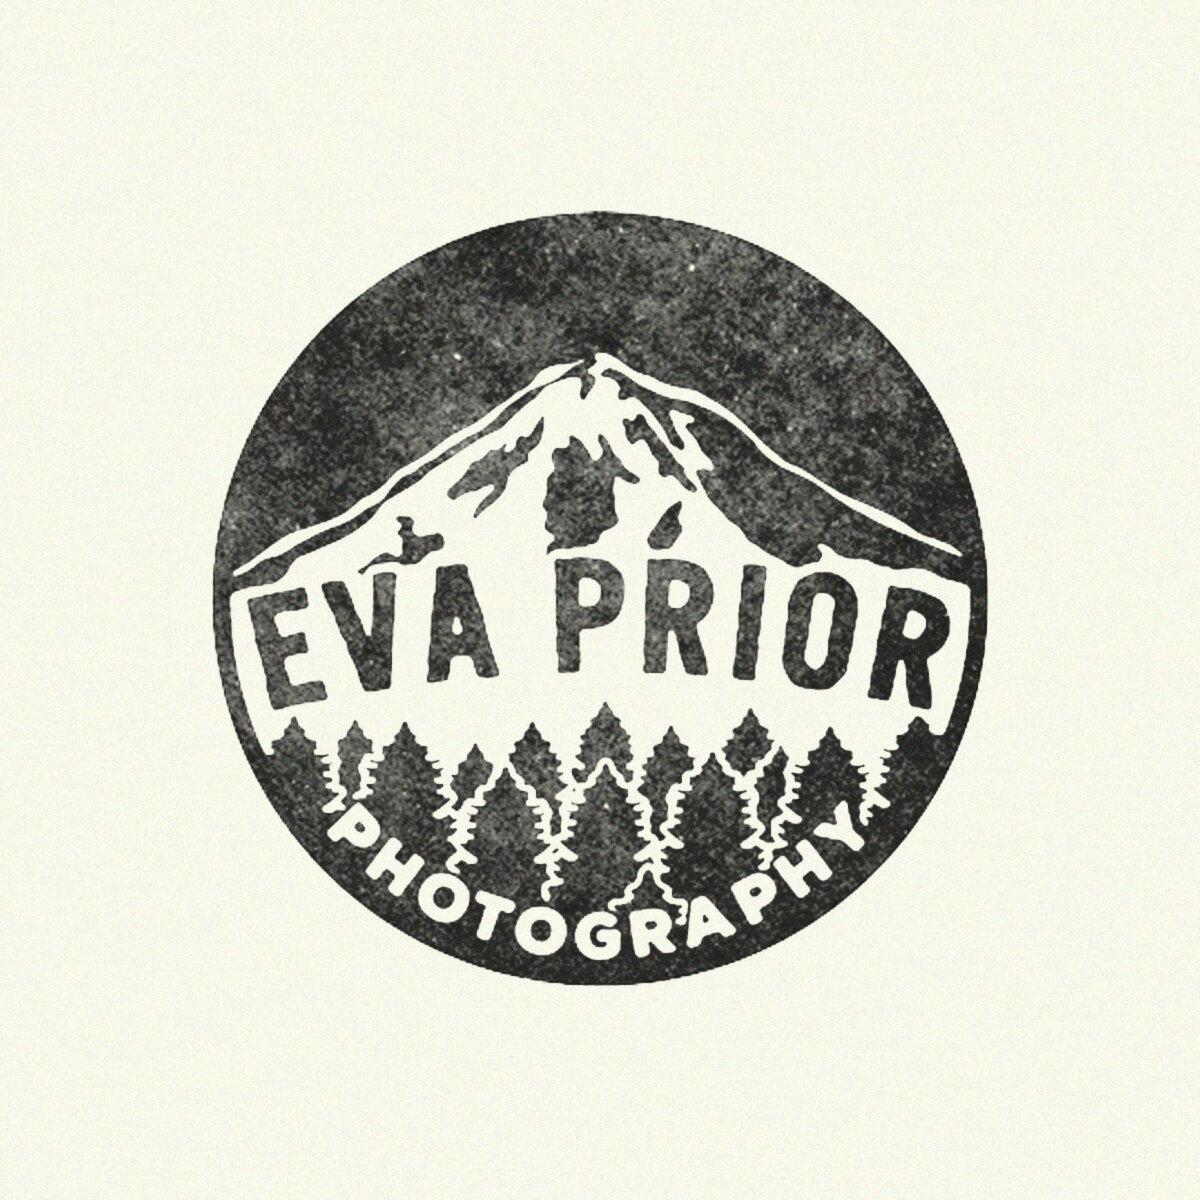 logo-update-01.jpg